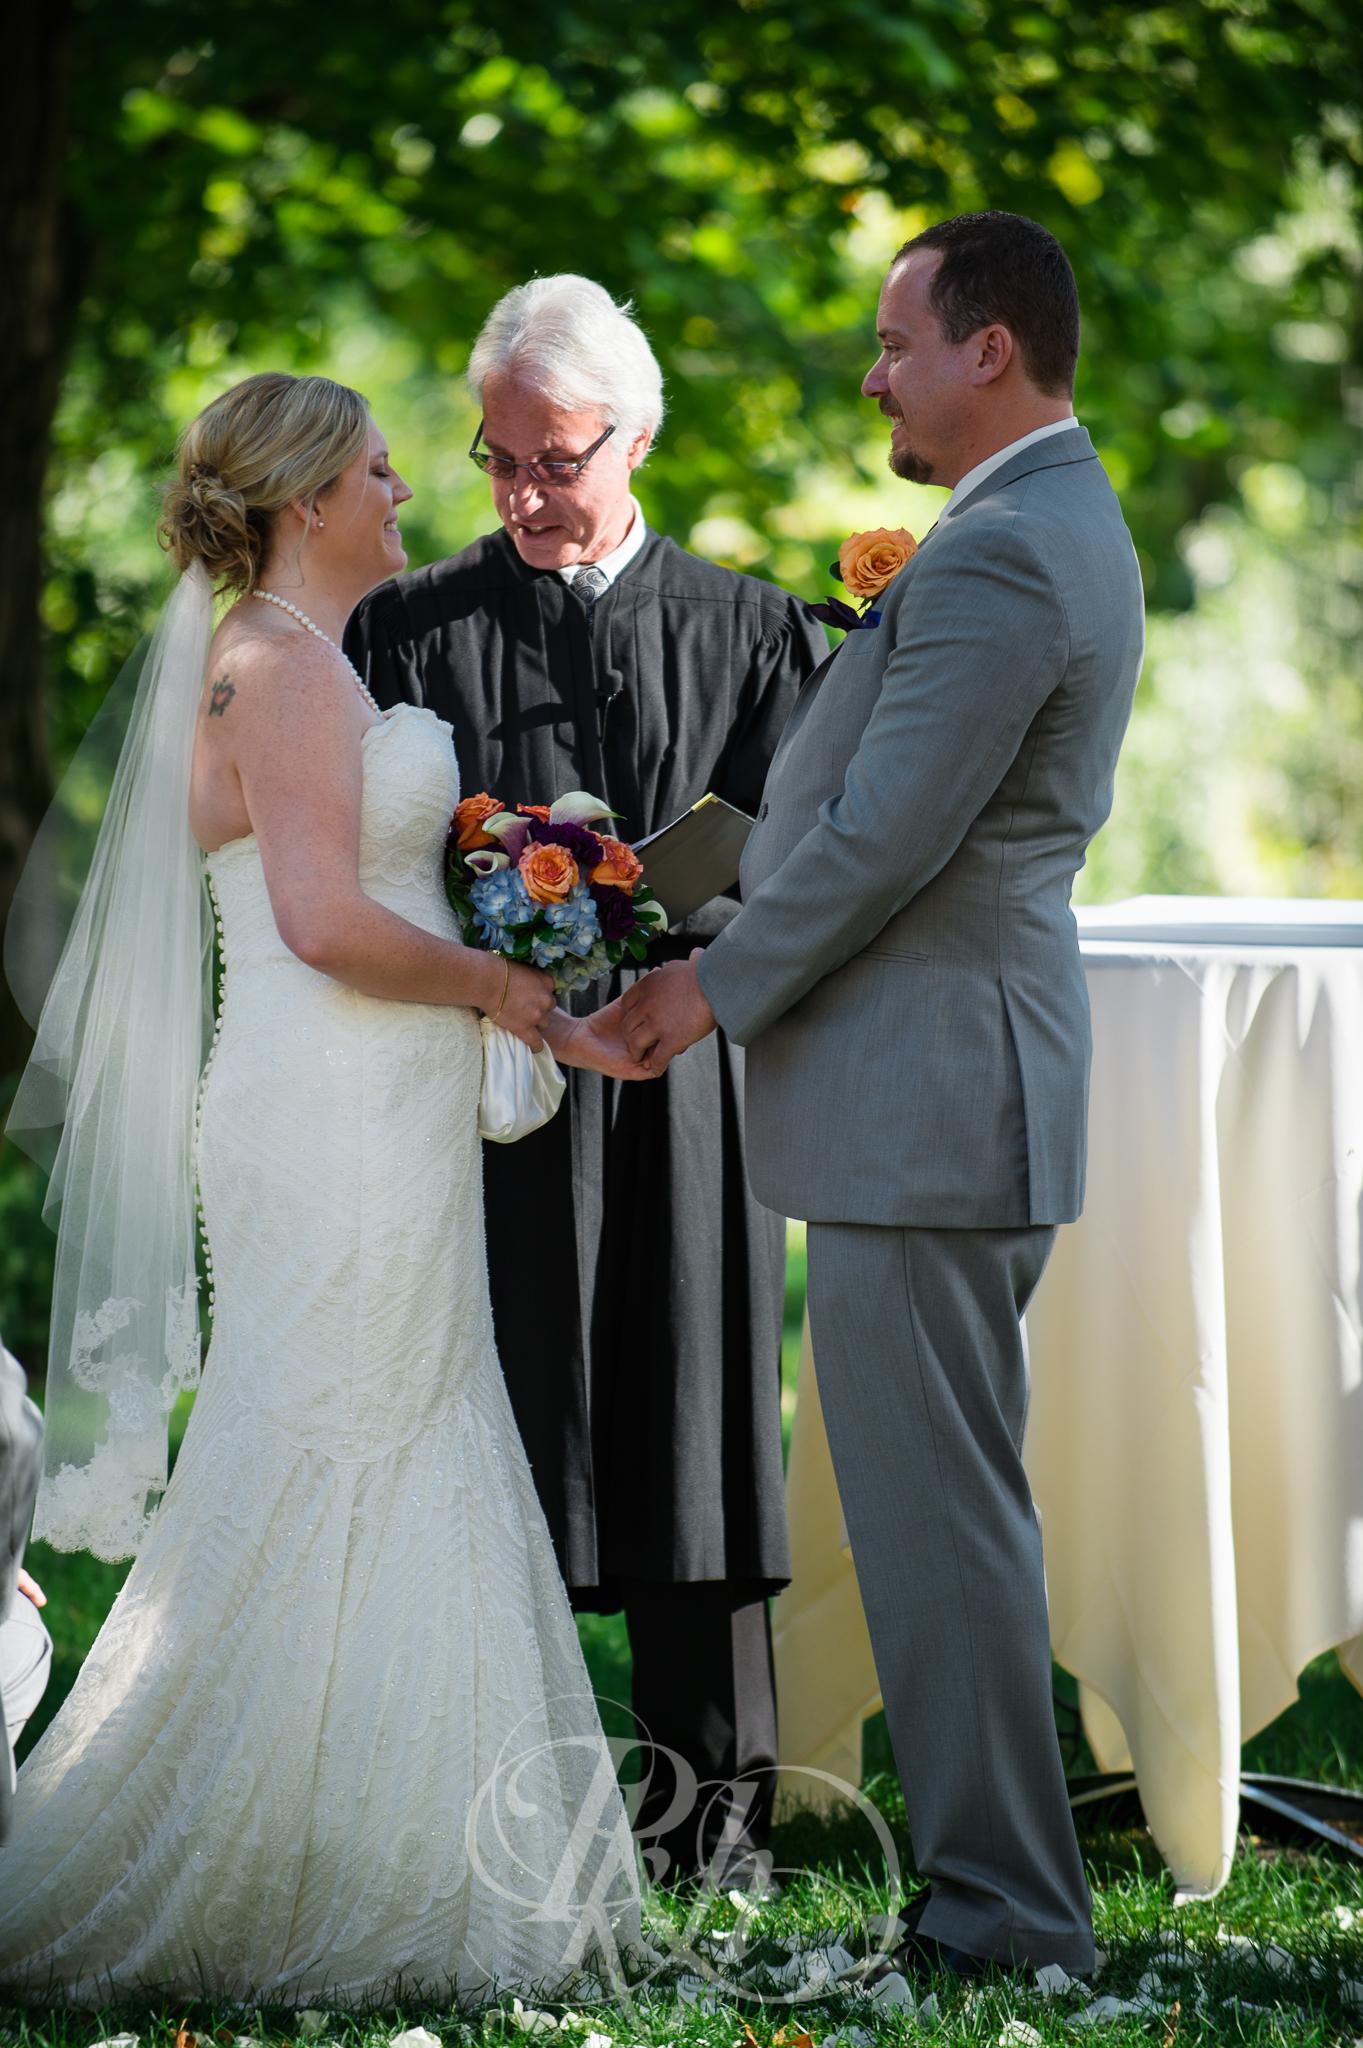 Jackie & Corey - Minnesota Wedding Photography - RKH Images -14.jpg